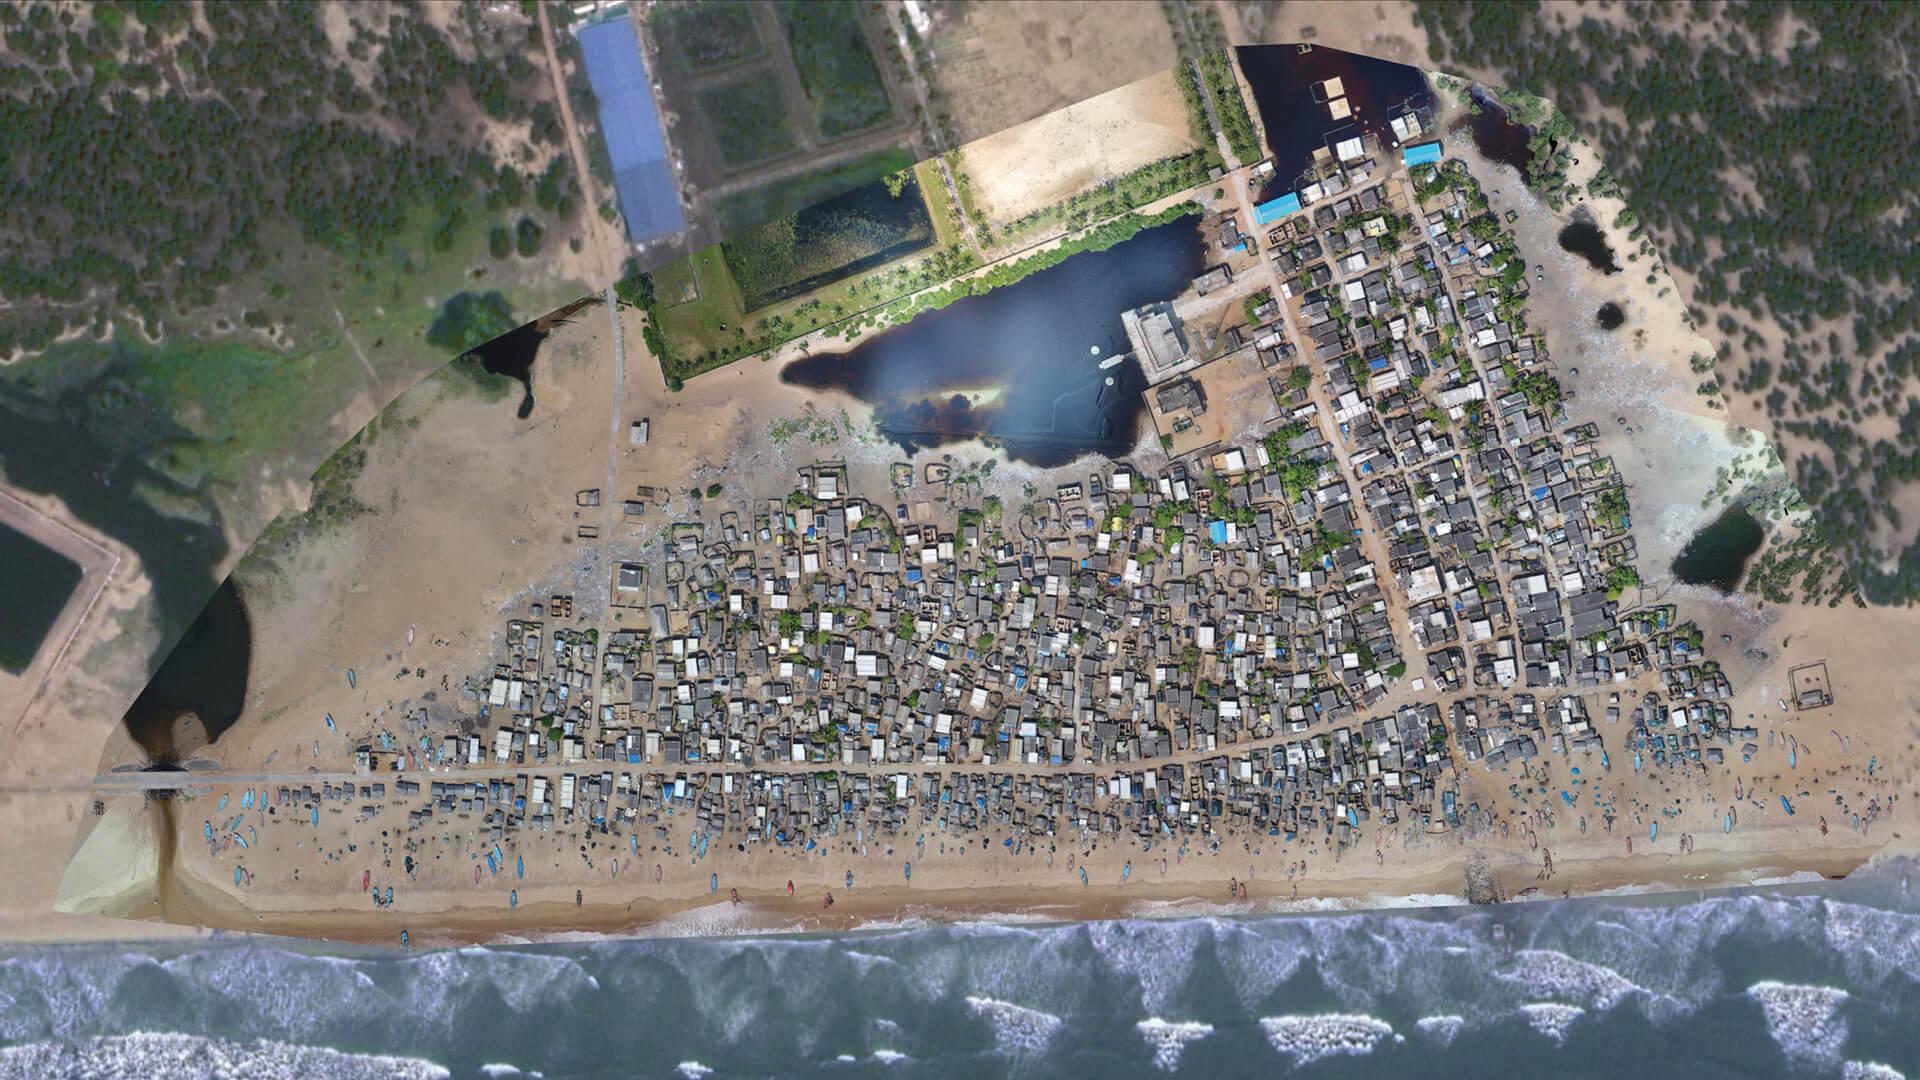 Drone Map of Pilot Site | Jaga Mission | Odisha Liveable Habitat Mission | Norman Foster Foundation | STIRworld